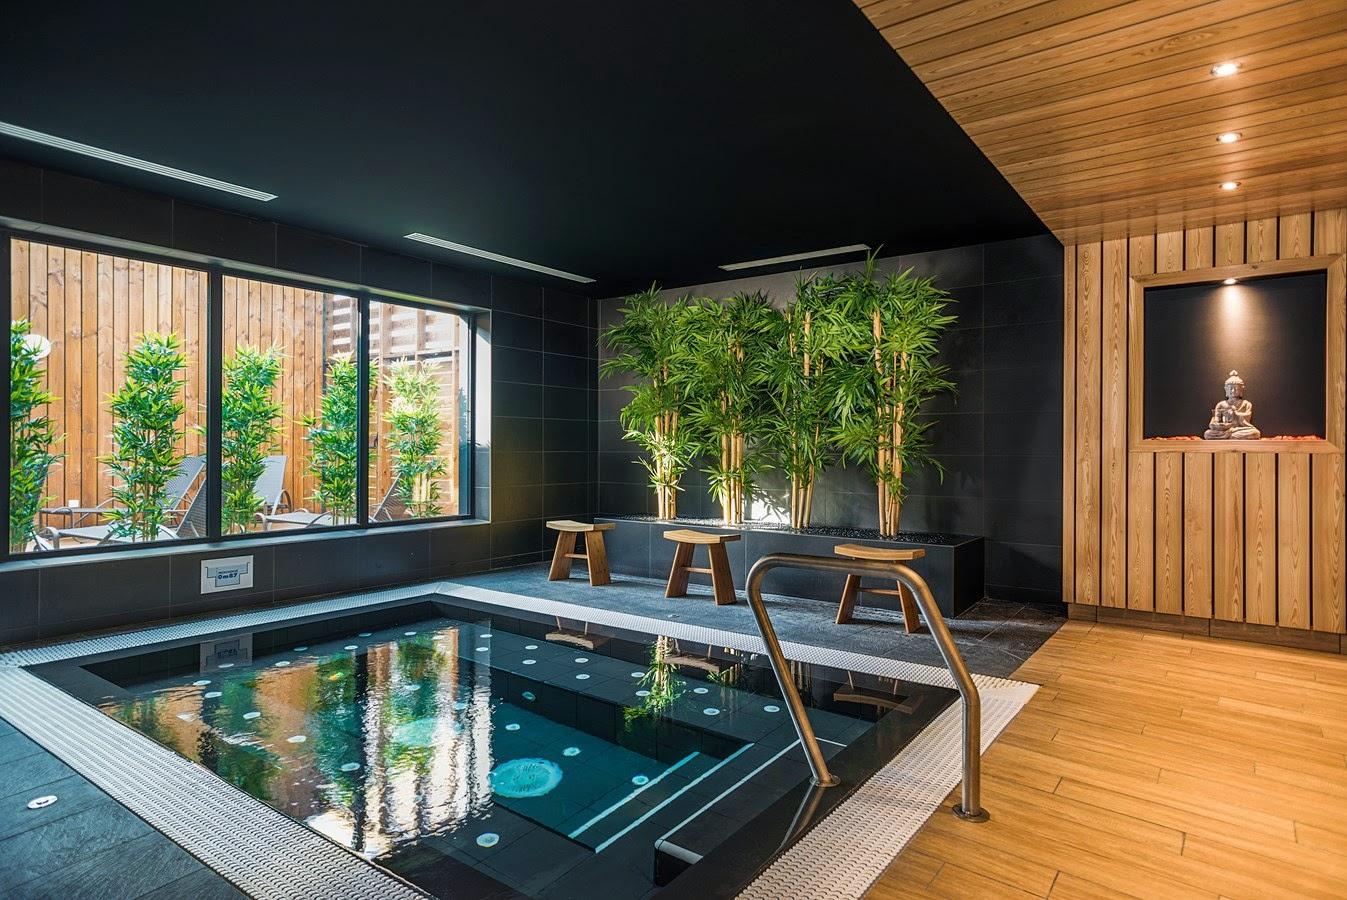 j 39 ai test le watermass au vital spa m me pas mal initiales gg. Black Bedroom Furniture Sets. Home Design Ideas